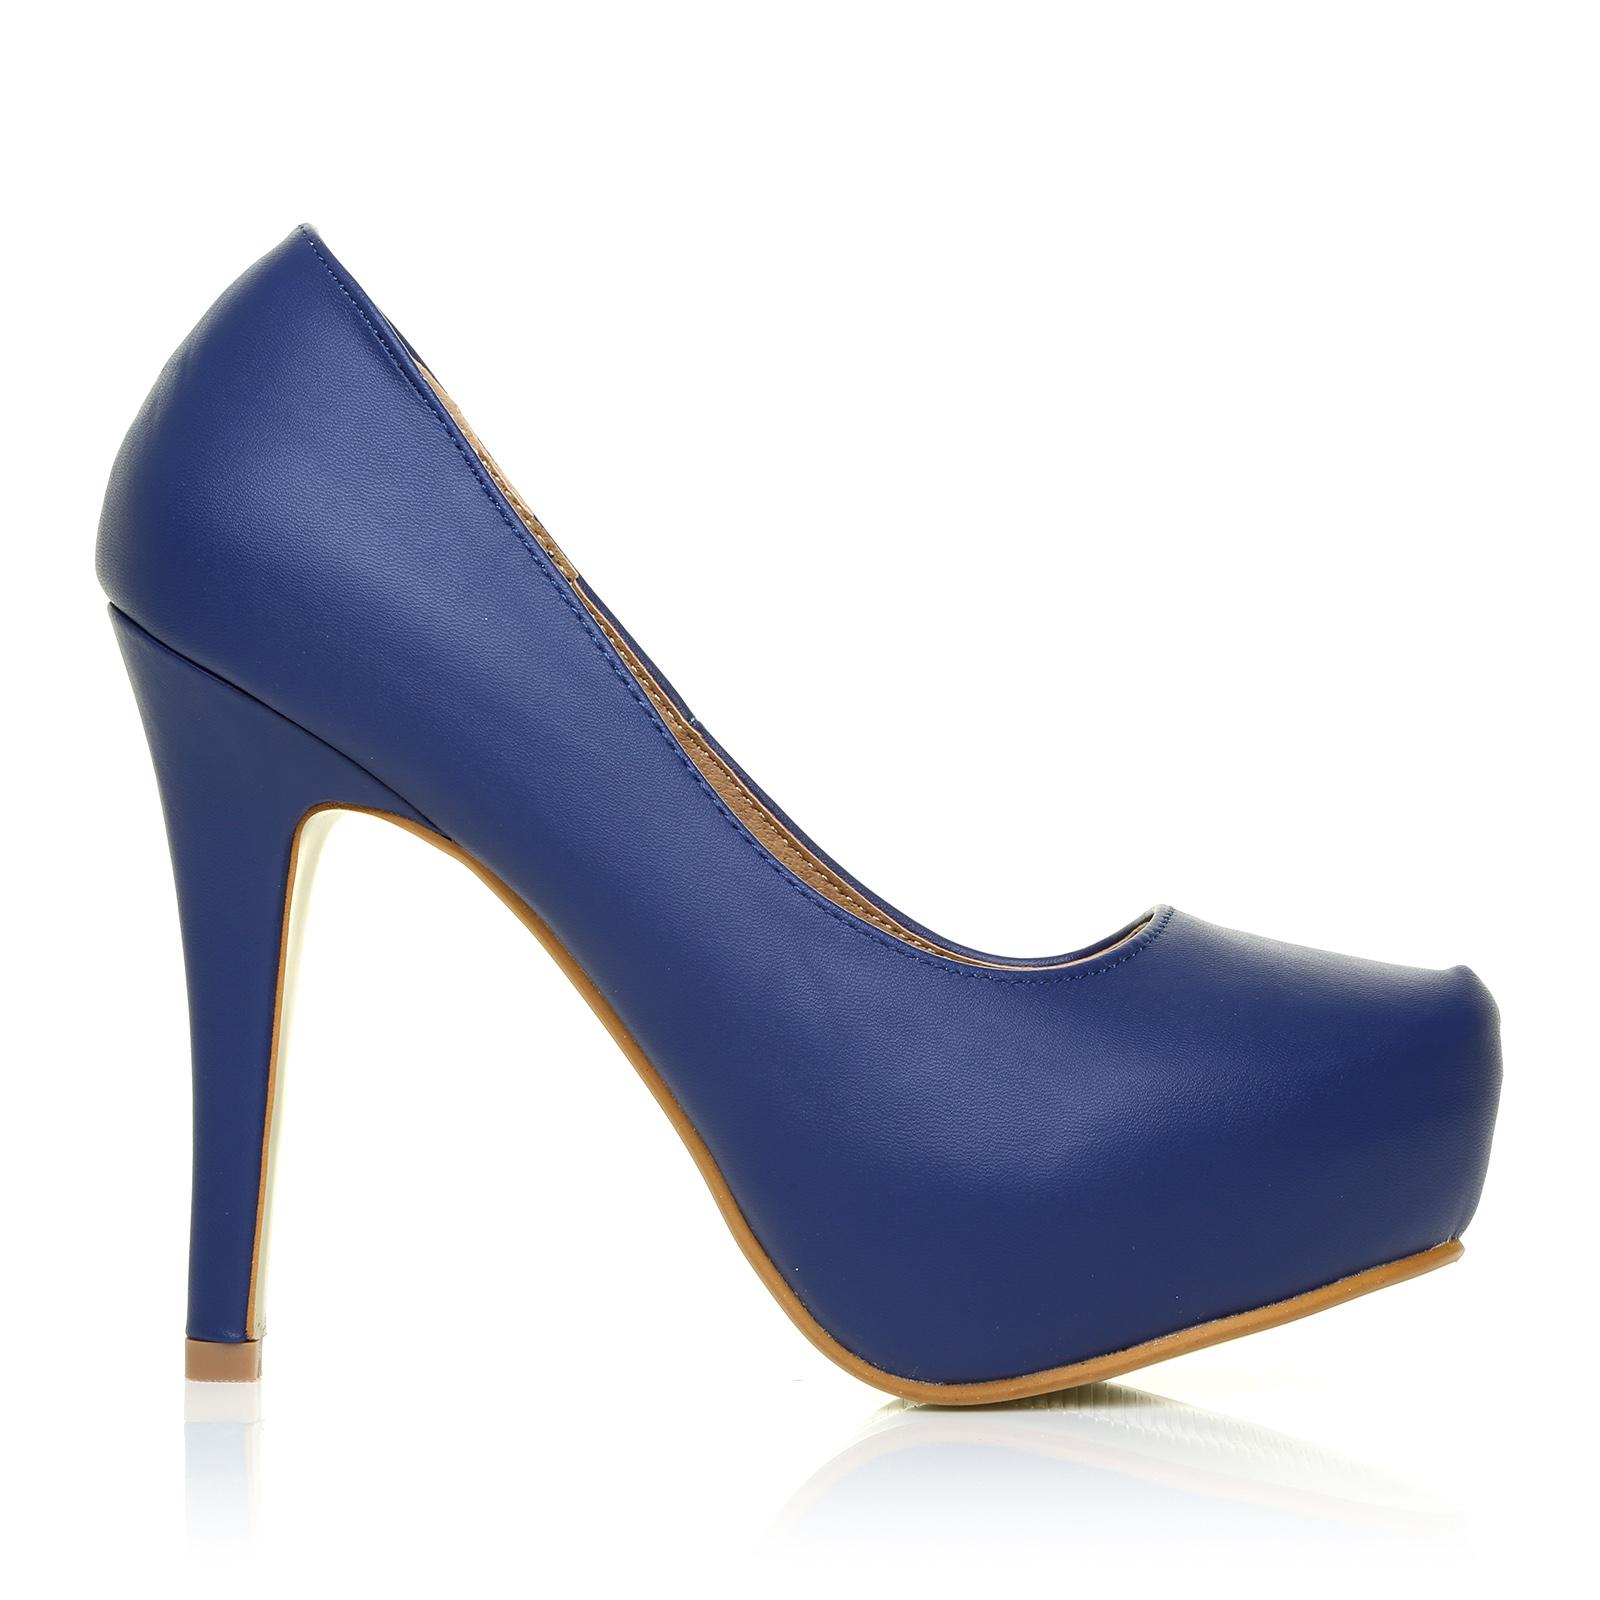 h251 navy pu leather stiletto high heel concealed platform